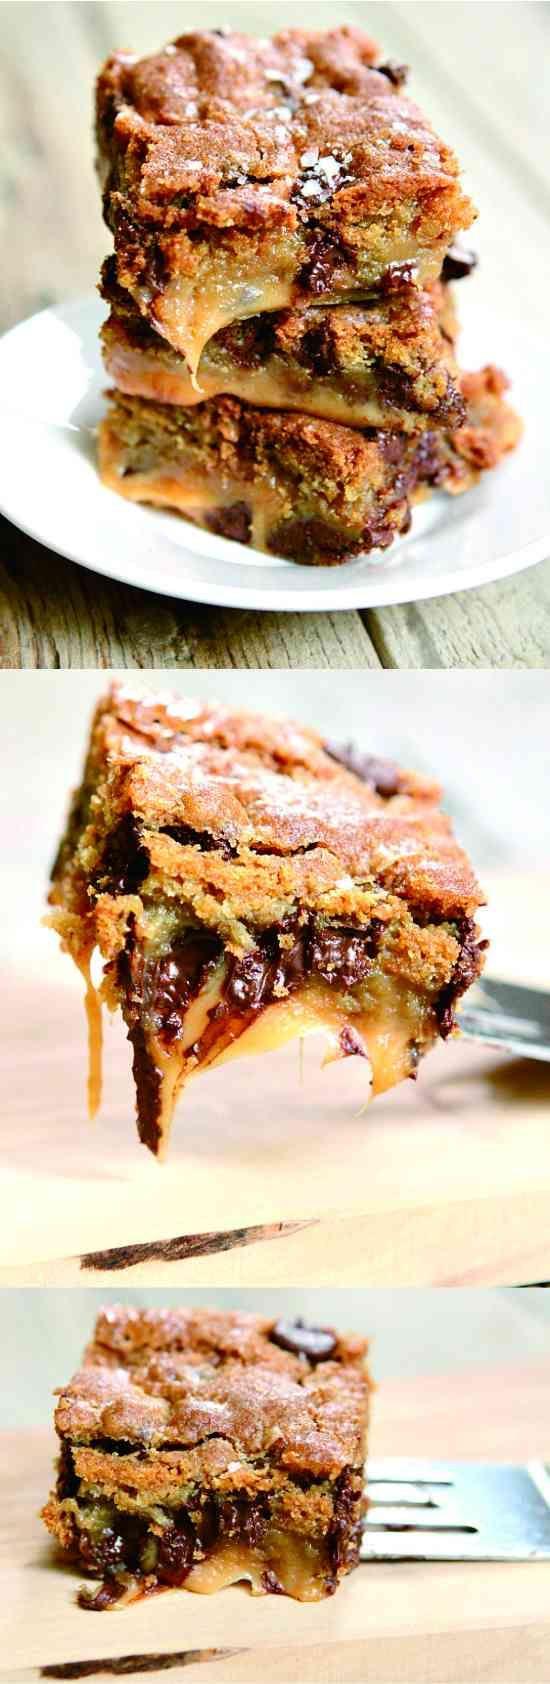 cake, caramel, chocolate, cookie, dessert, recipes